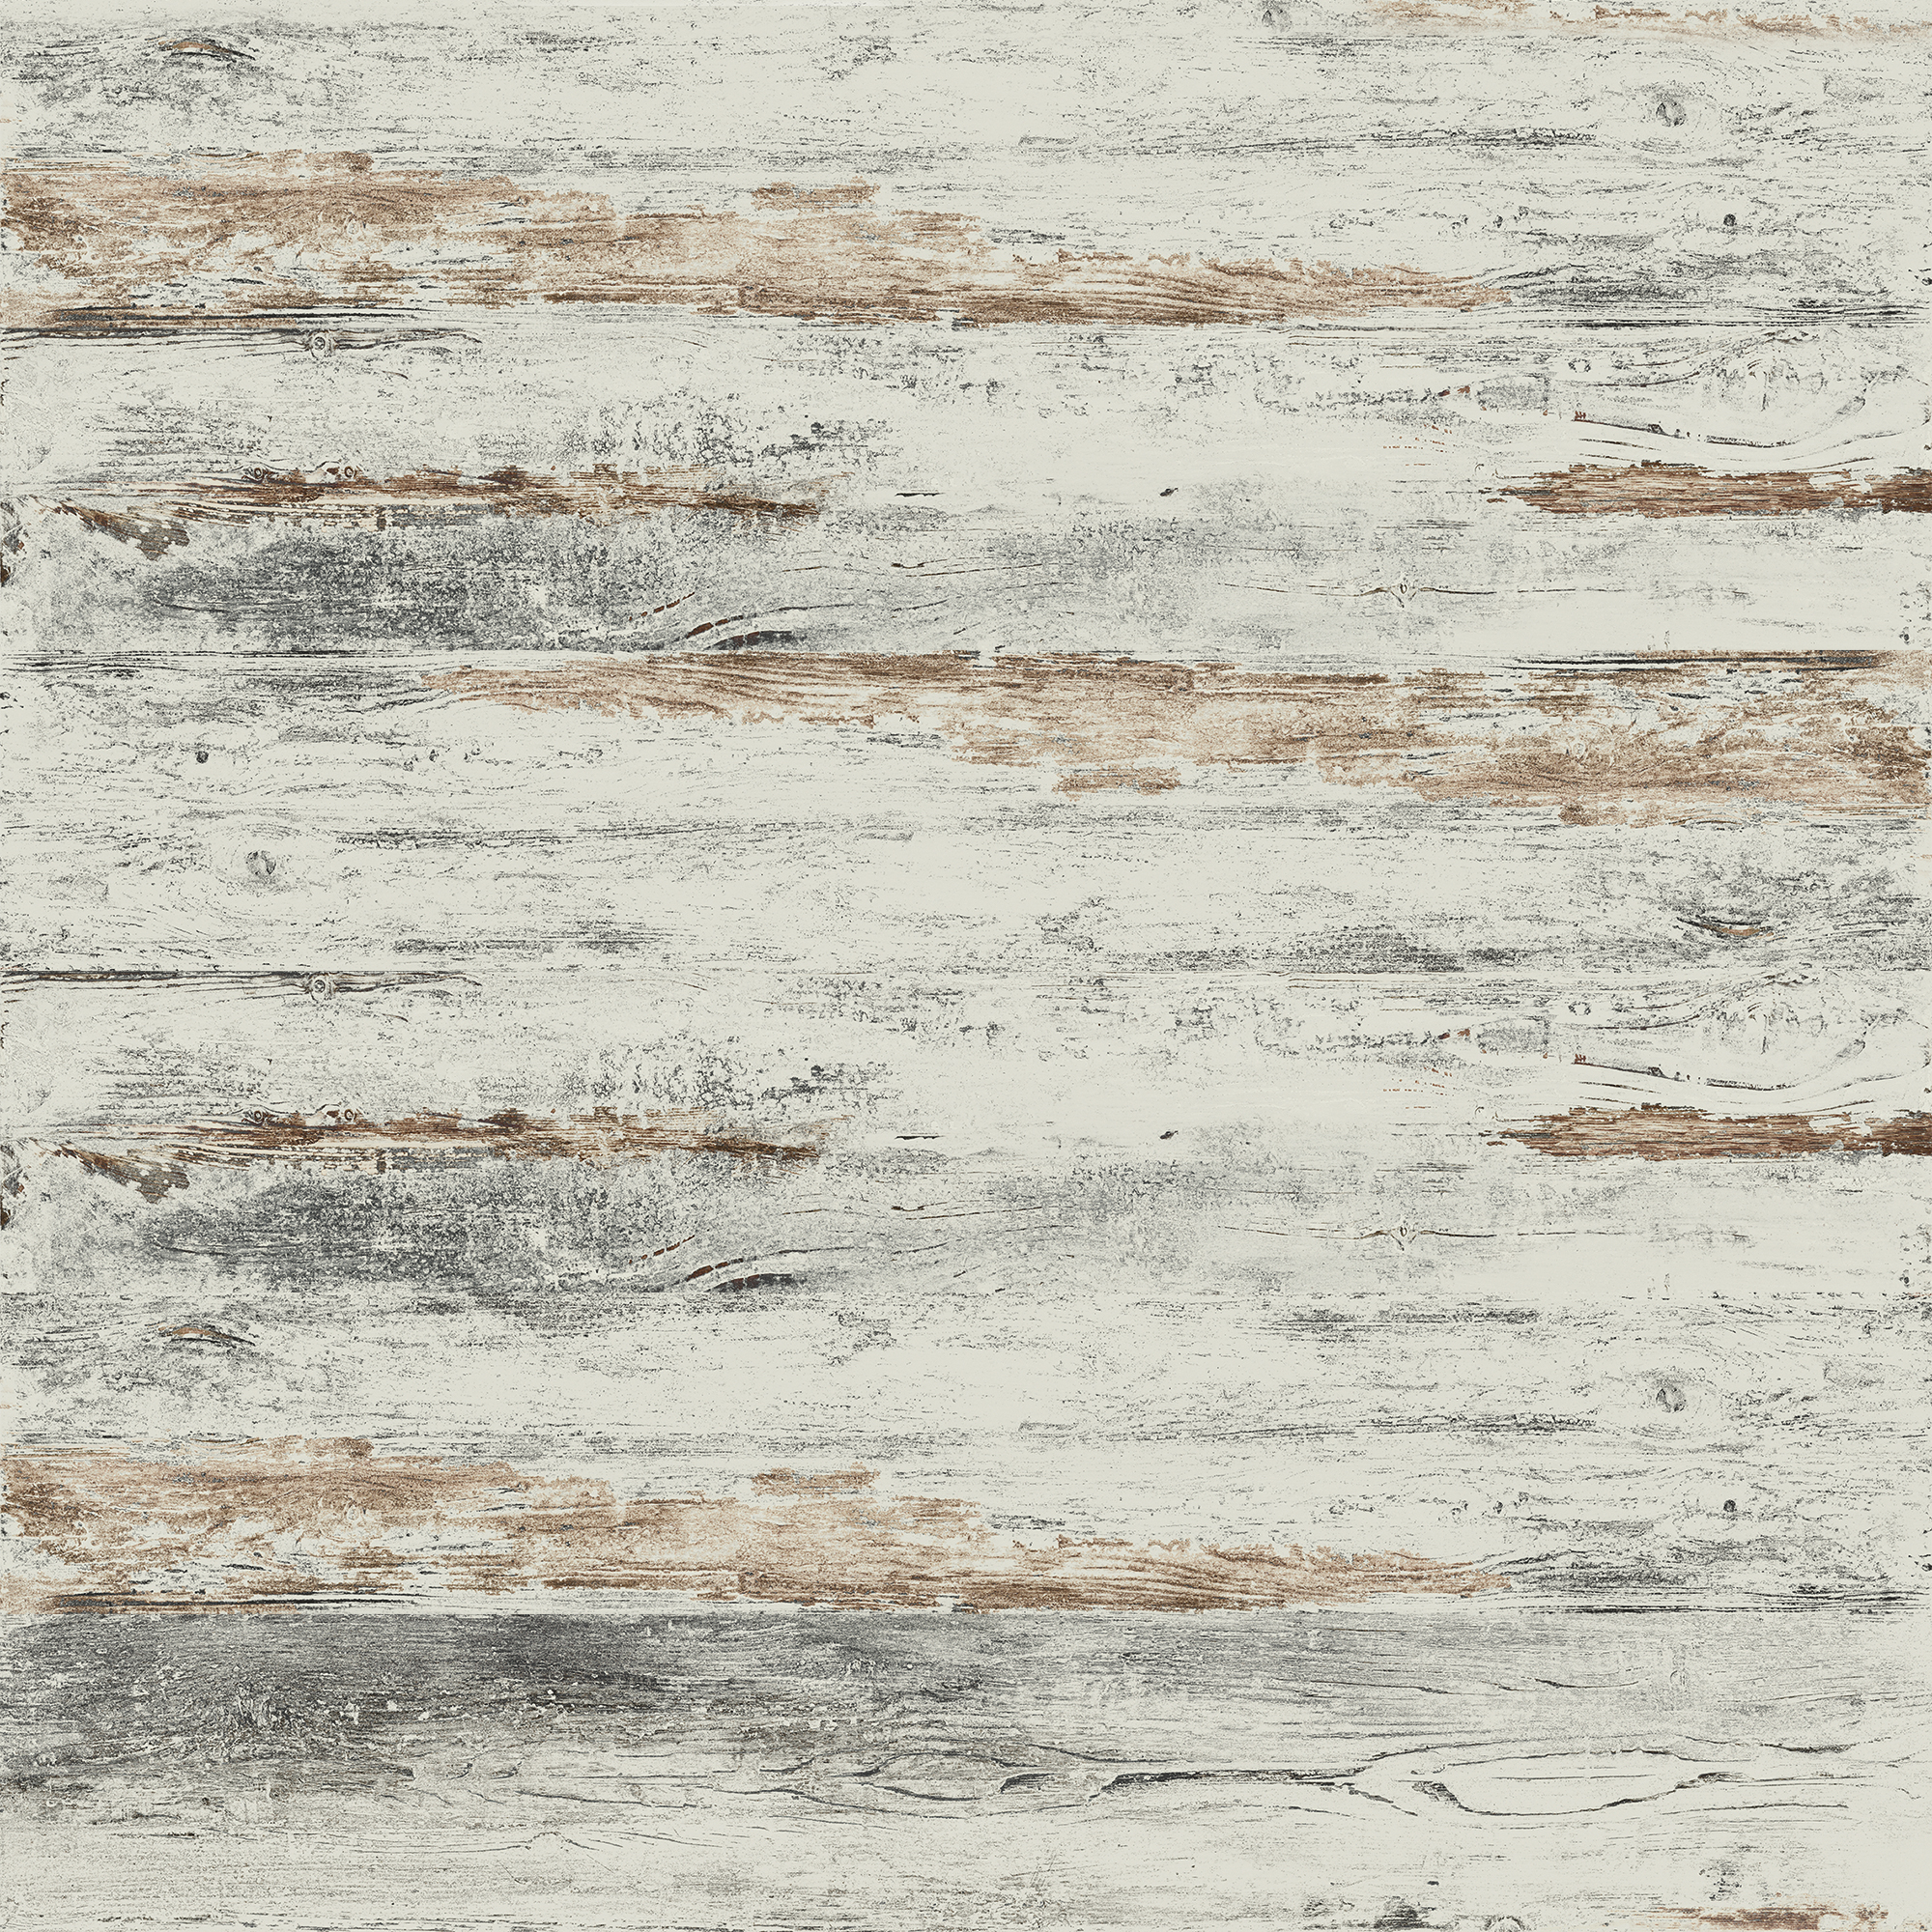 mamawood antique white 8x48 glazed porcelain floor wall tile - Antique Floor Tiles